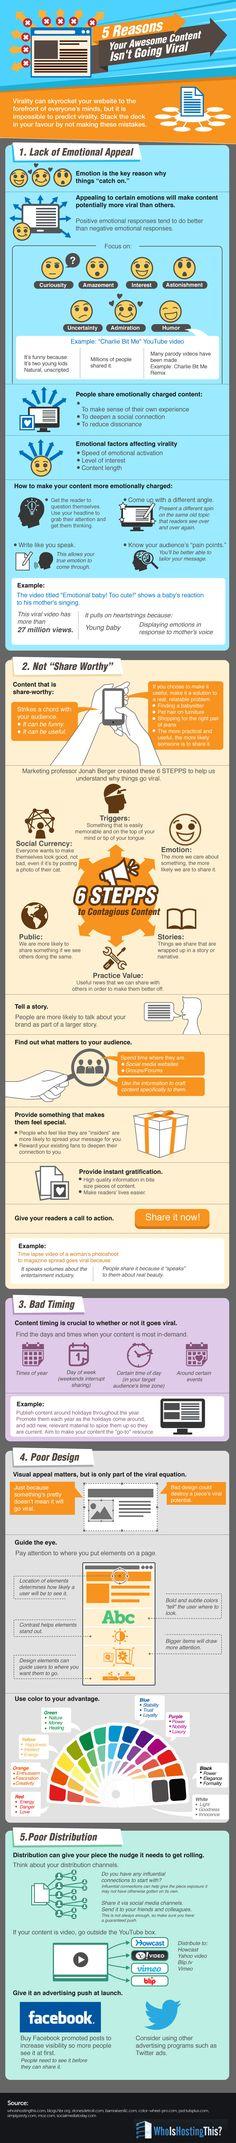 The Science Behind Going #Viral - #infographic #socialmedia http://www.pinterest.com/TheHitman14/social-media-tips-%2B/